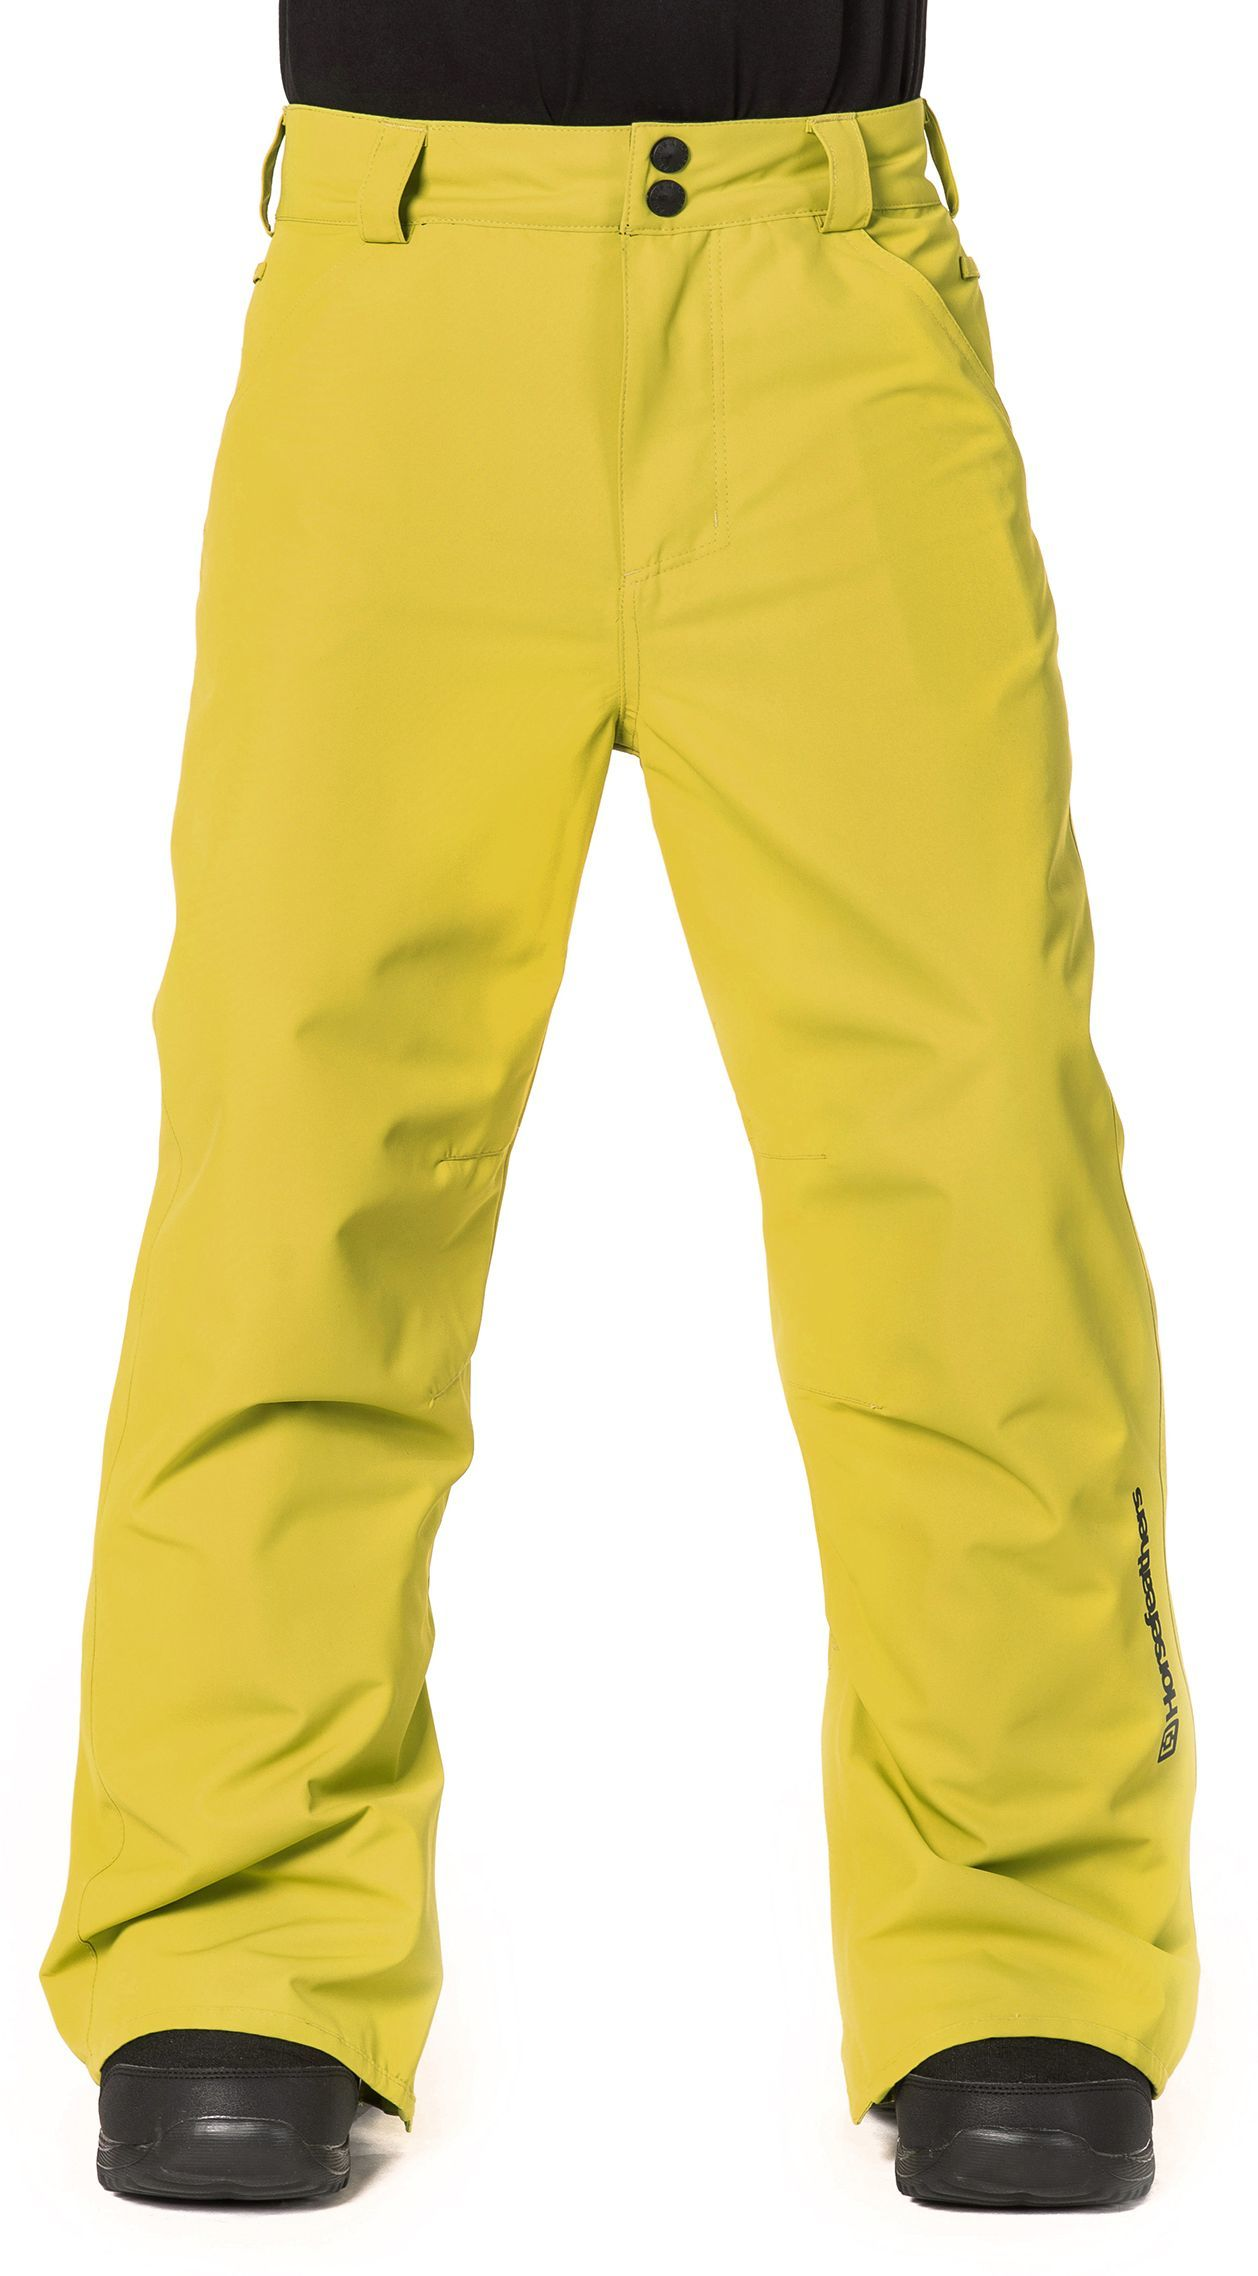 zimowe spodnie dziecięce HORSEFEATHERS PINBALL KIDS PANTS (apple green)